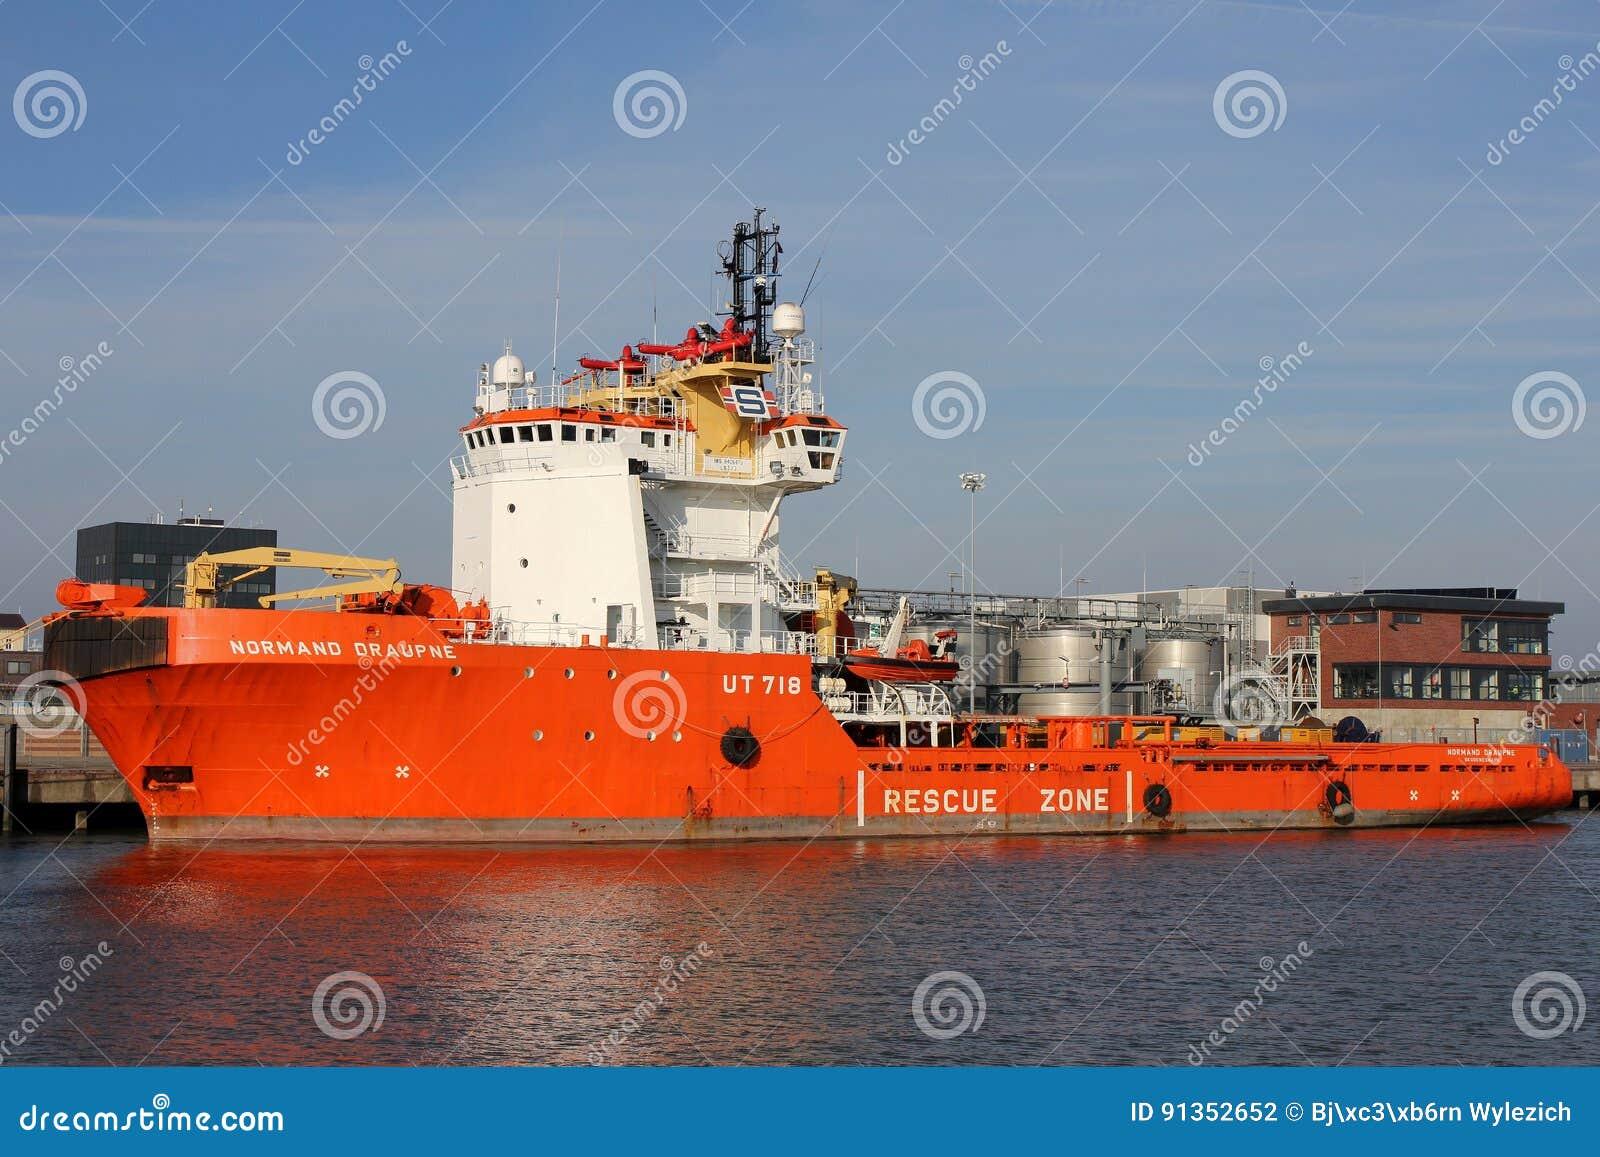 NORMAND DRAUPNE door Solstad Offshore in werking die wordt gesteld die